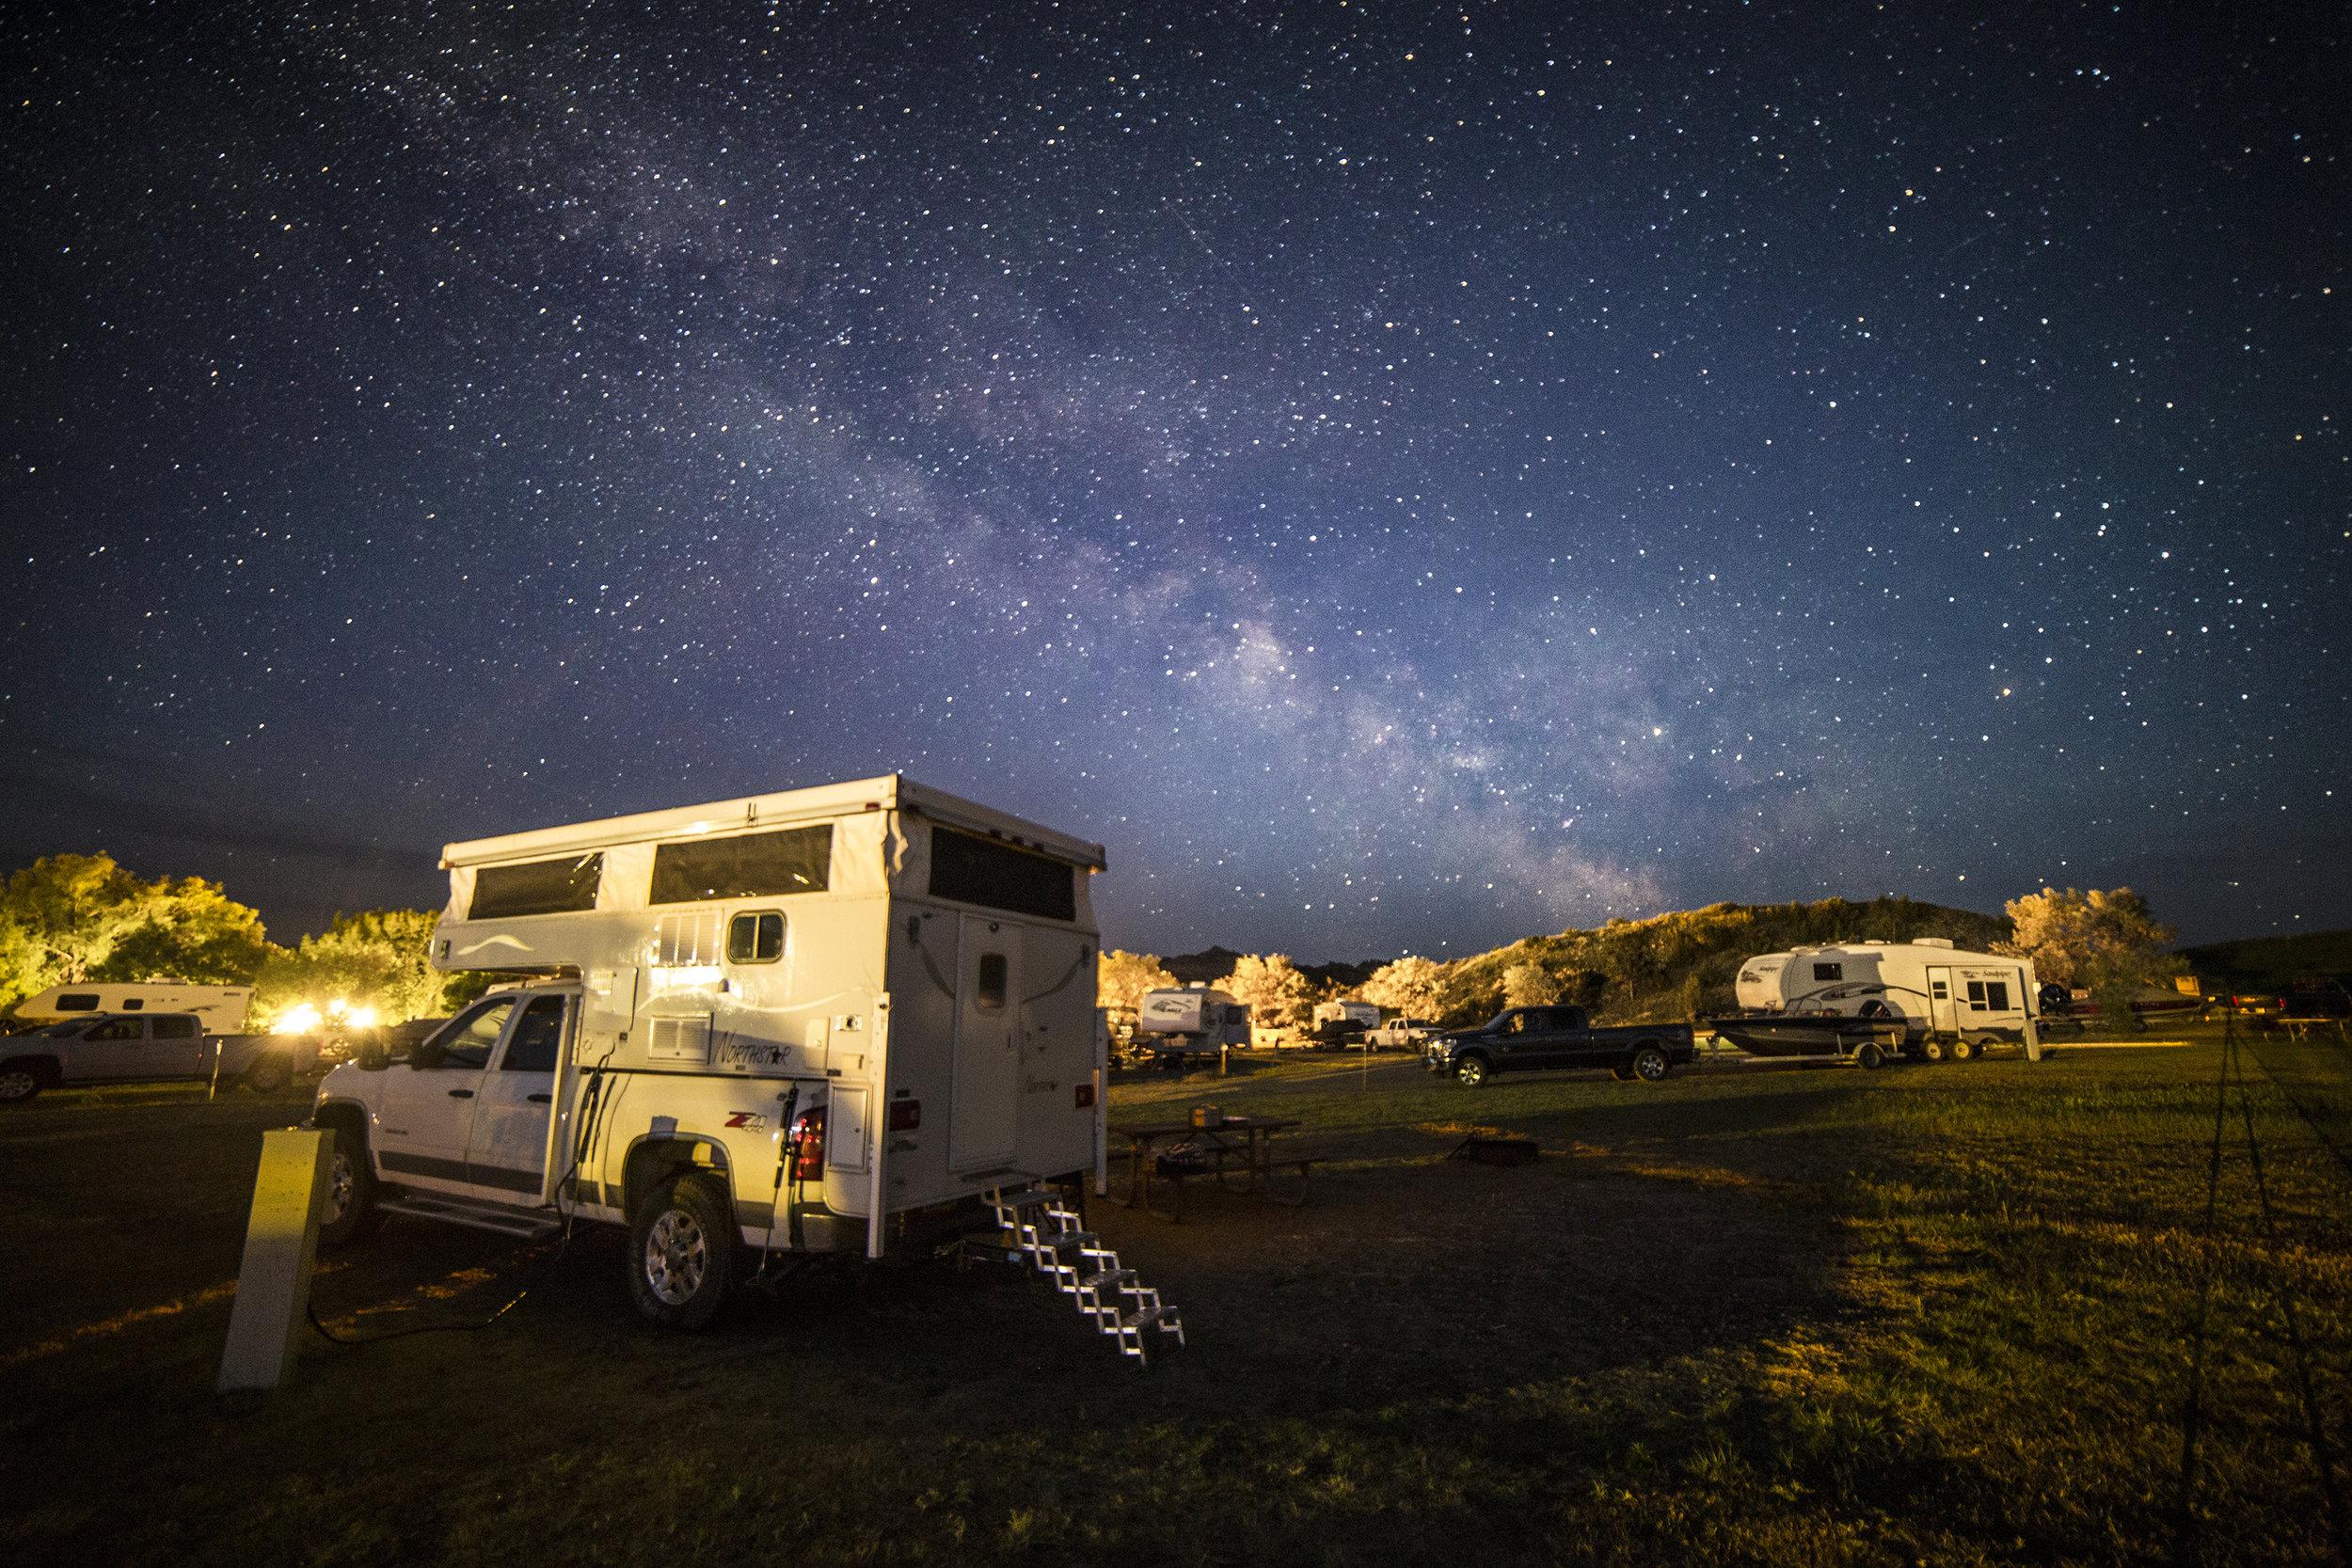 Milky Way - View Photos